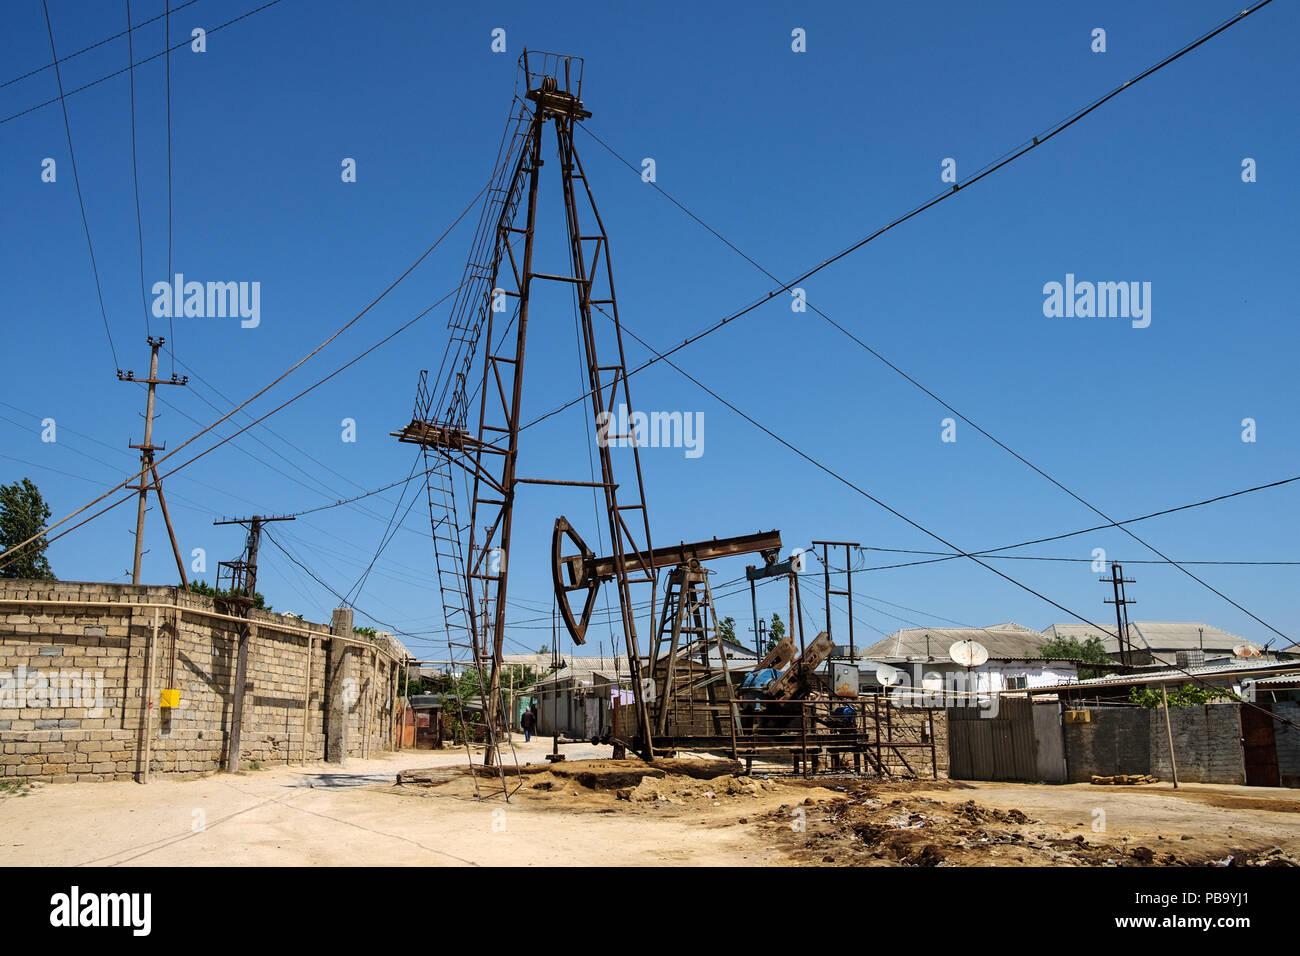 Oil pumps in Sabunchu area in the outskirts of Baku, Azerbaijan. - Stock Image